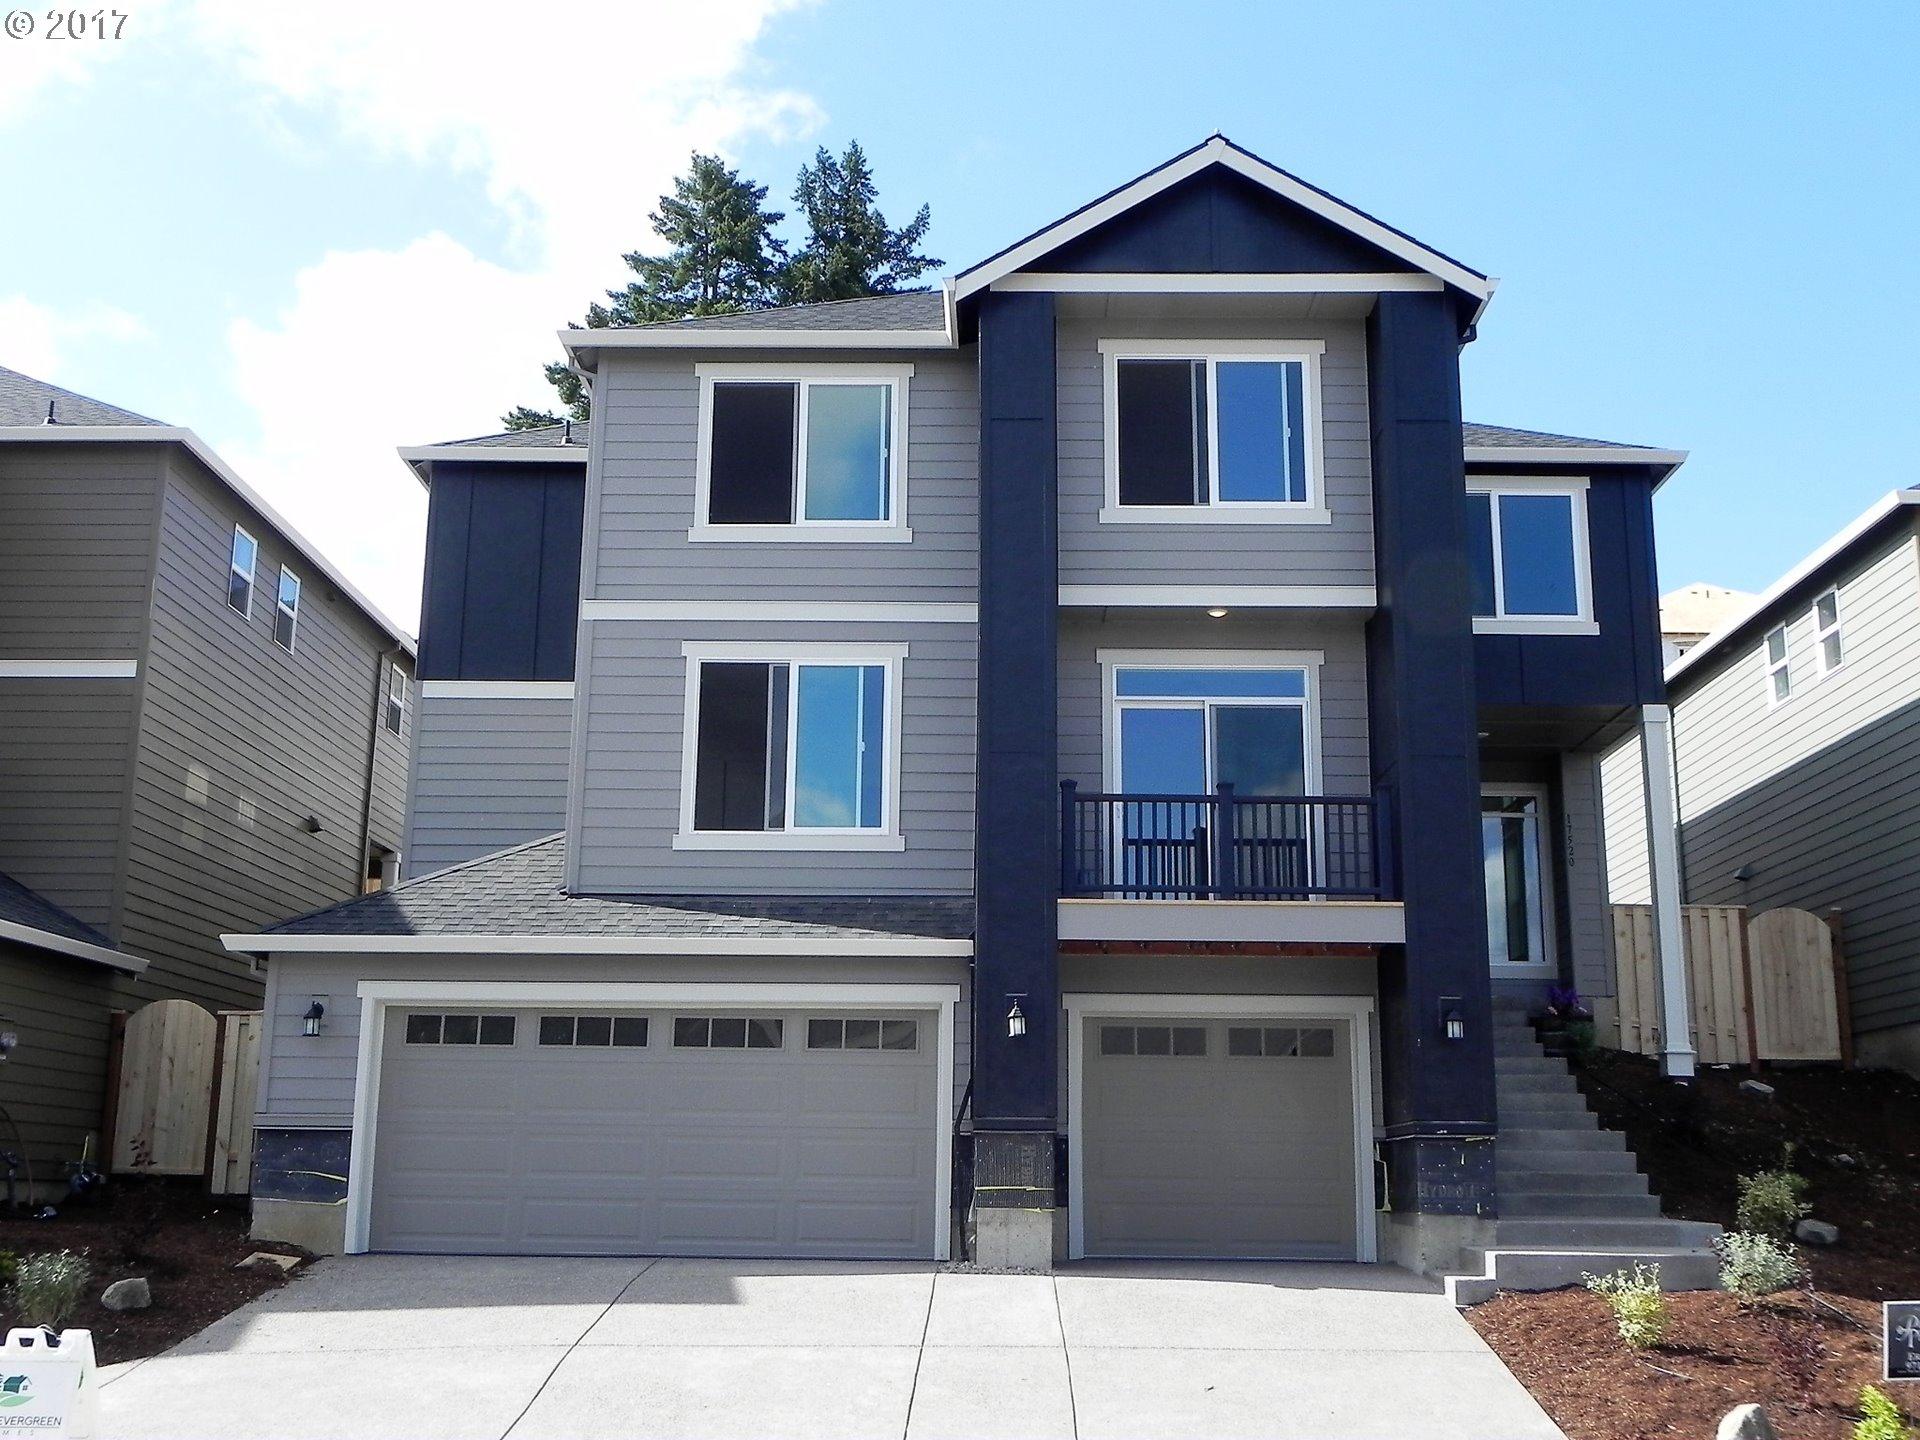 17520 SW Loma Vista ST Beaverton, OR 97007 - MLS #: 17435067